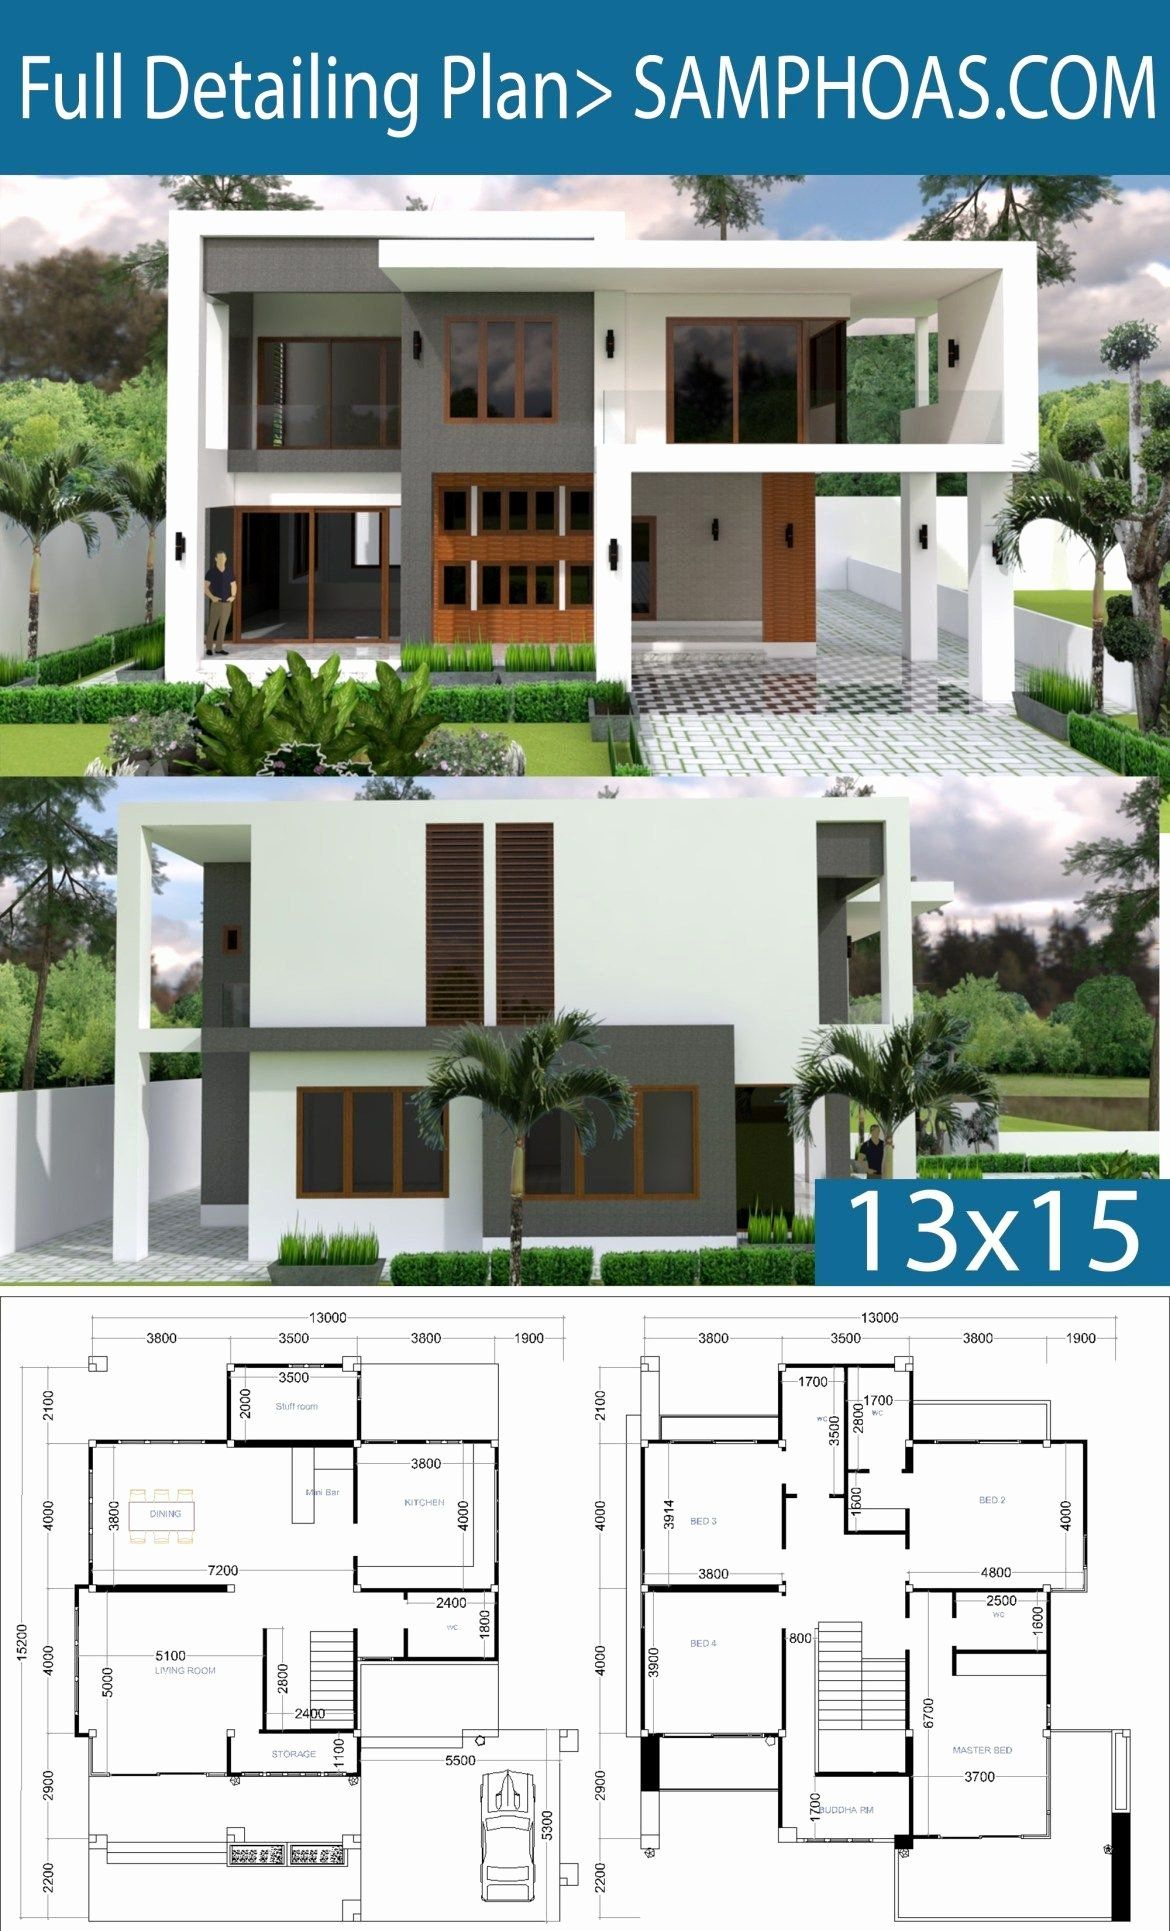 Modern House Plans Free Luxury Modern 4 Bedrooms House Plan 13x13m In 2020 4 Bedroom House Plans Modern House Plans Bedroom House Plans